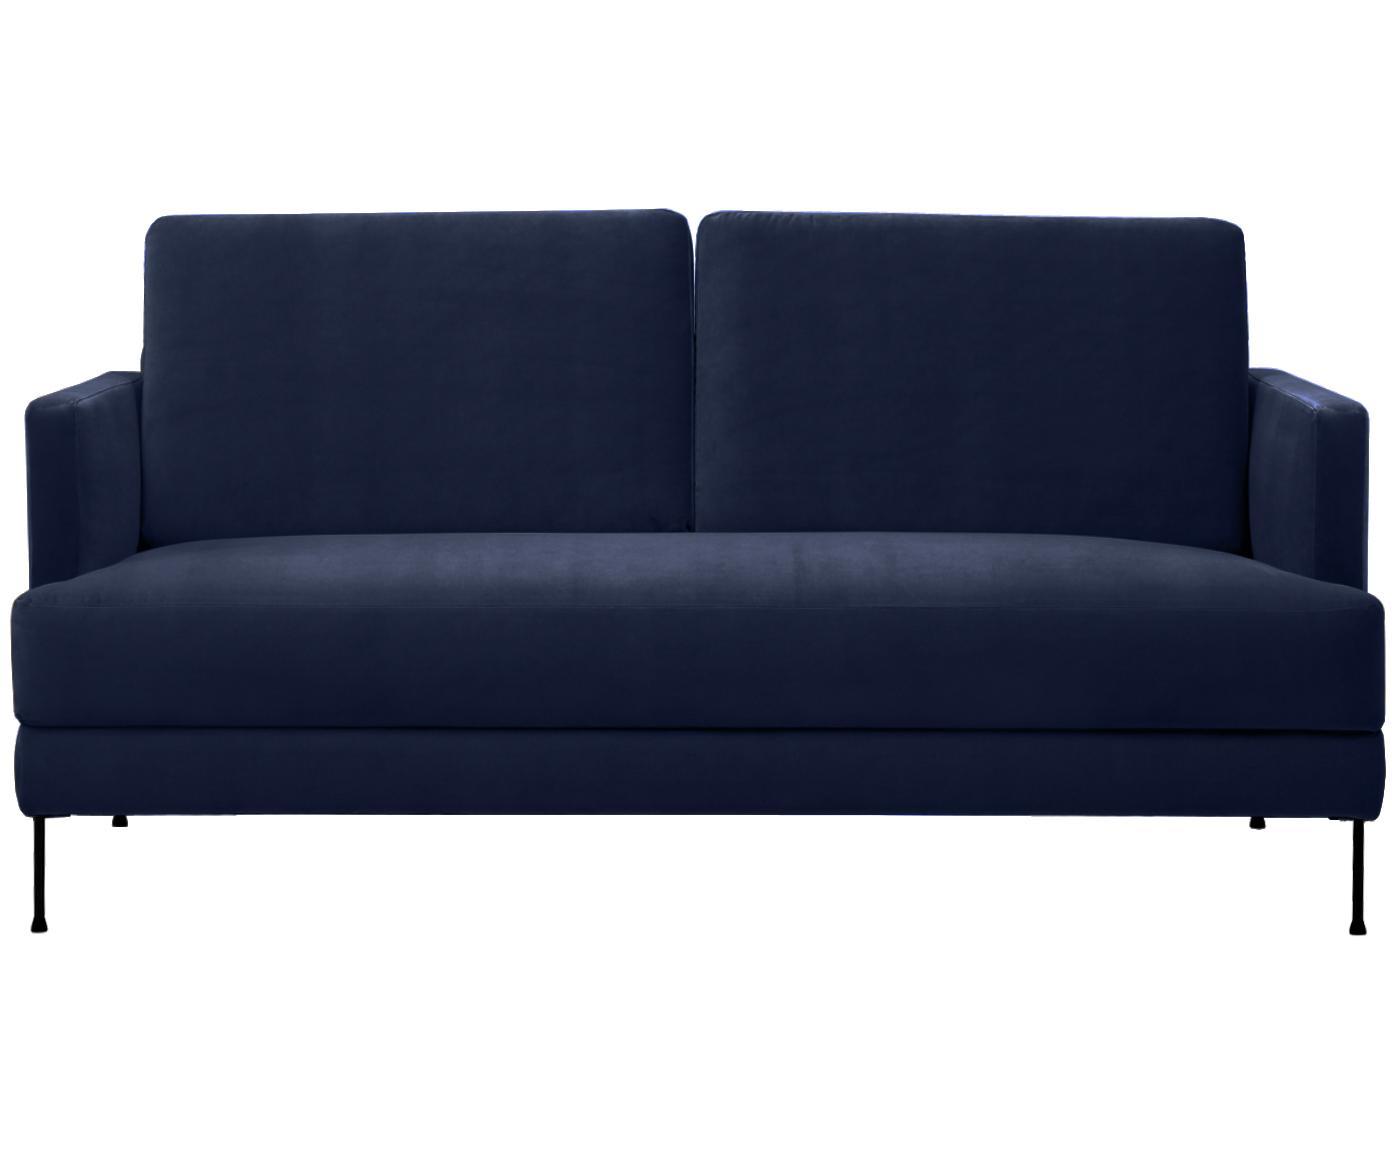 Fluwelen bank Fluente (2-zits), Bekleding: fluweel (hoogwaardig poly, Frame: massief grenenhout, Poten: gelakt metaal, Donkerblauw, B 168 x D 83 cm